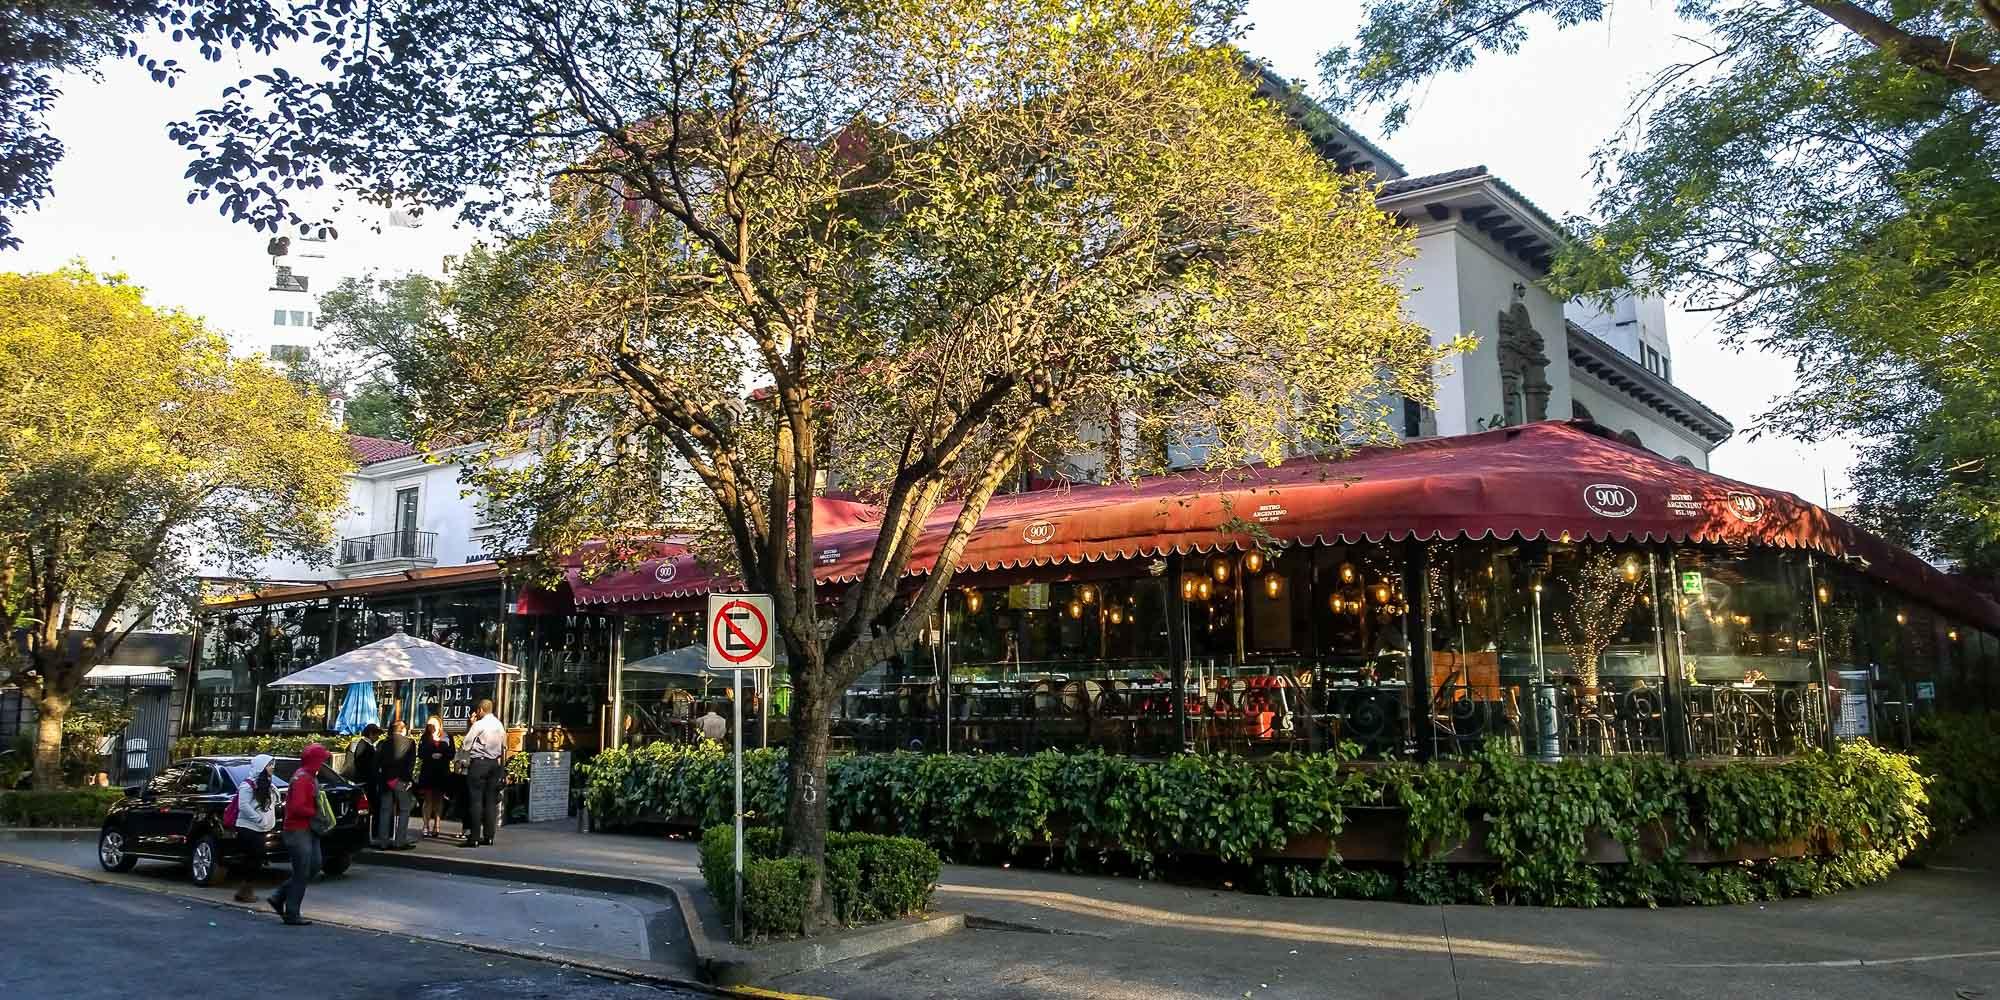 A restaurant in Polanco neighborhood in Mexico City